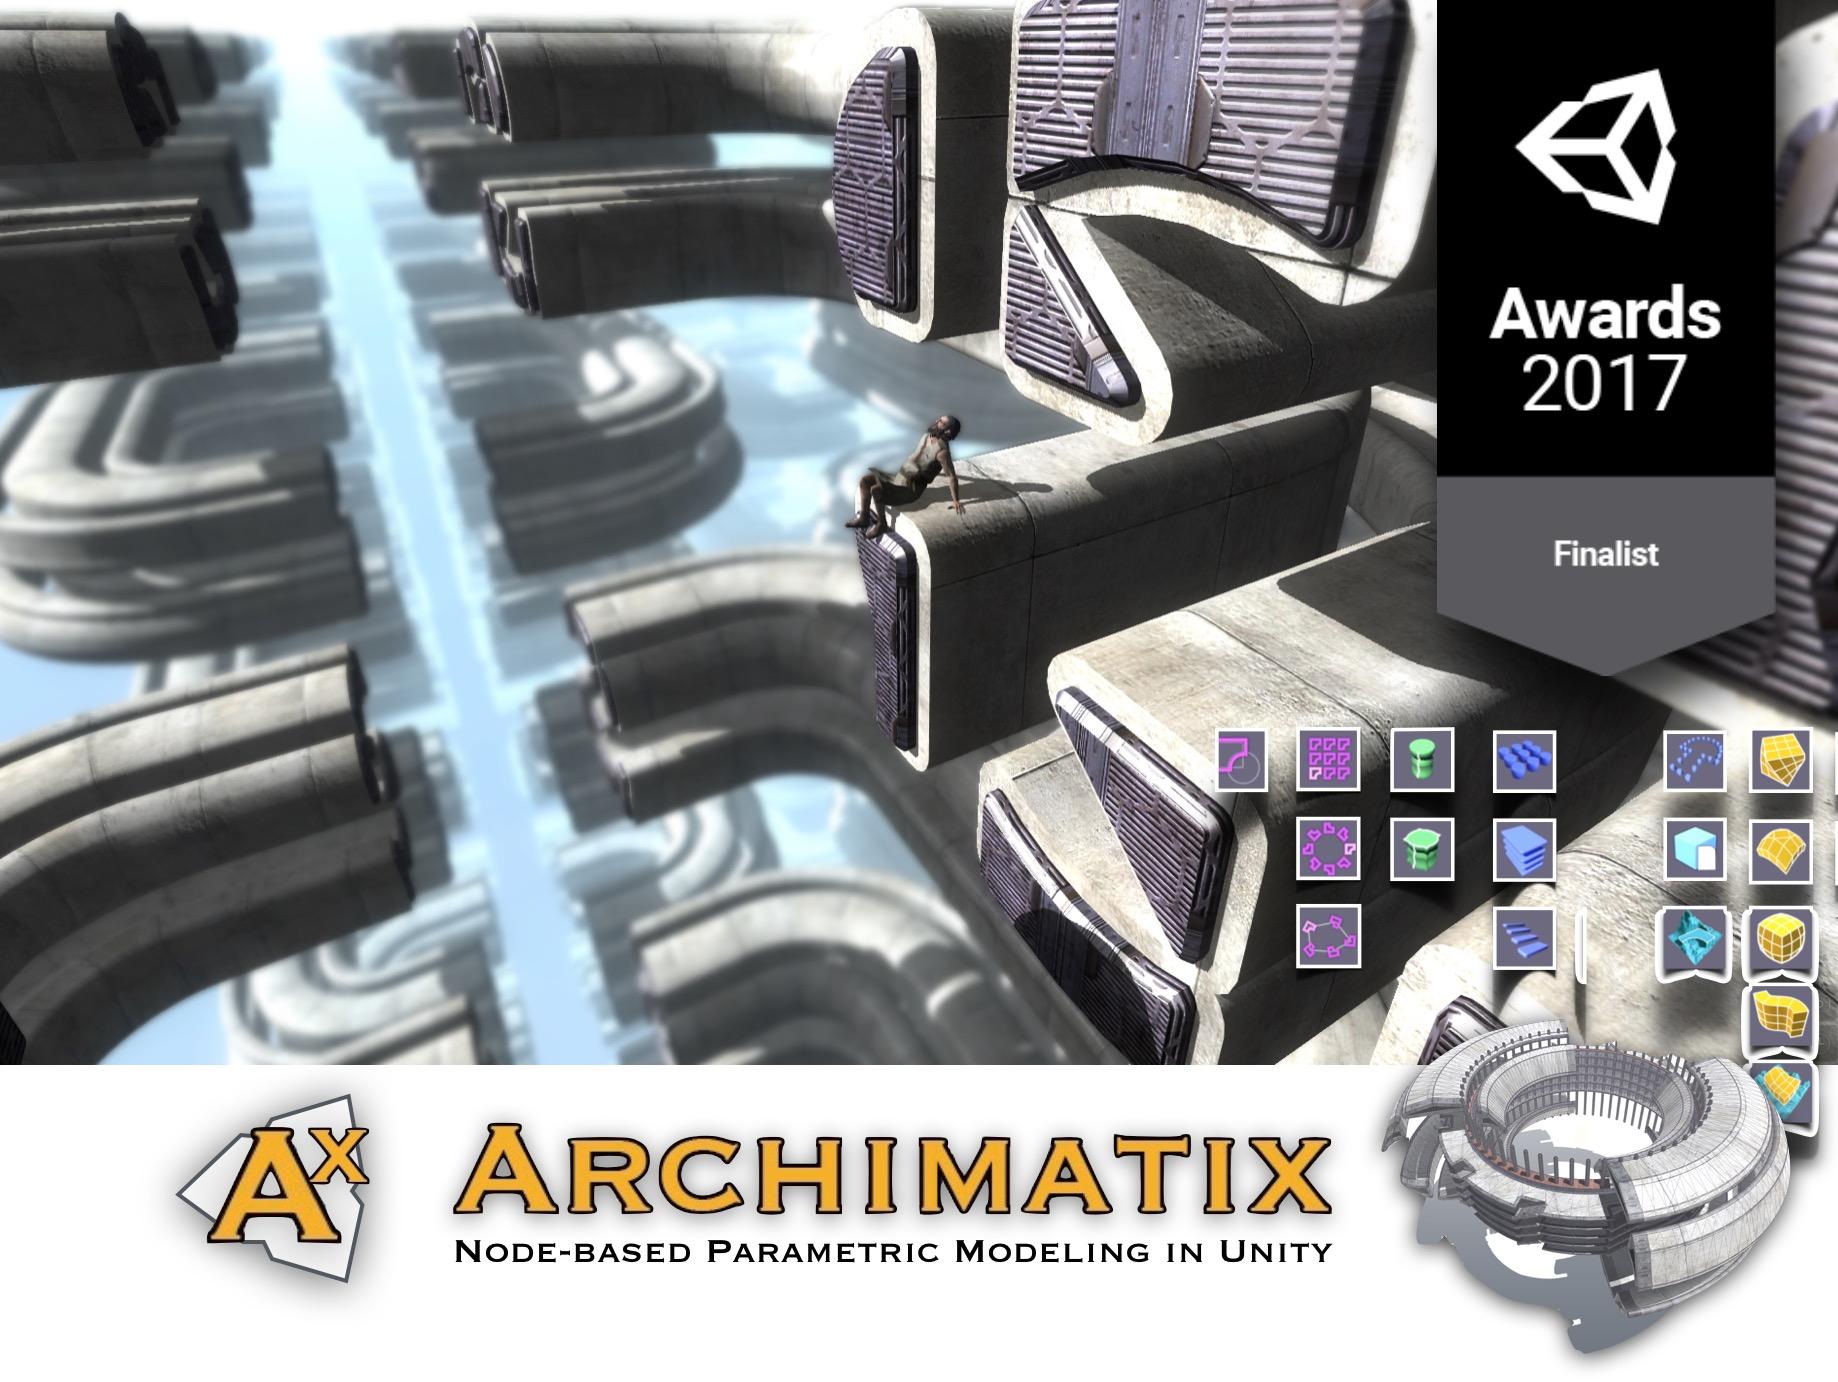 Archimatix 2017-09-13_04-44-33_PM-1.jpg